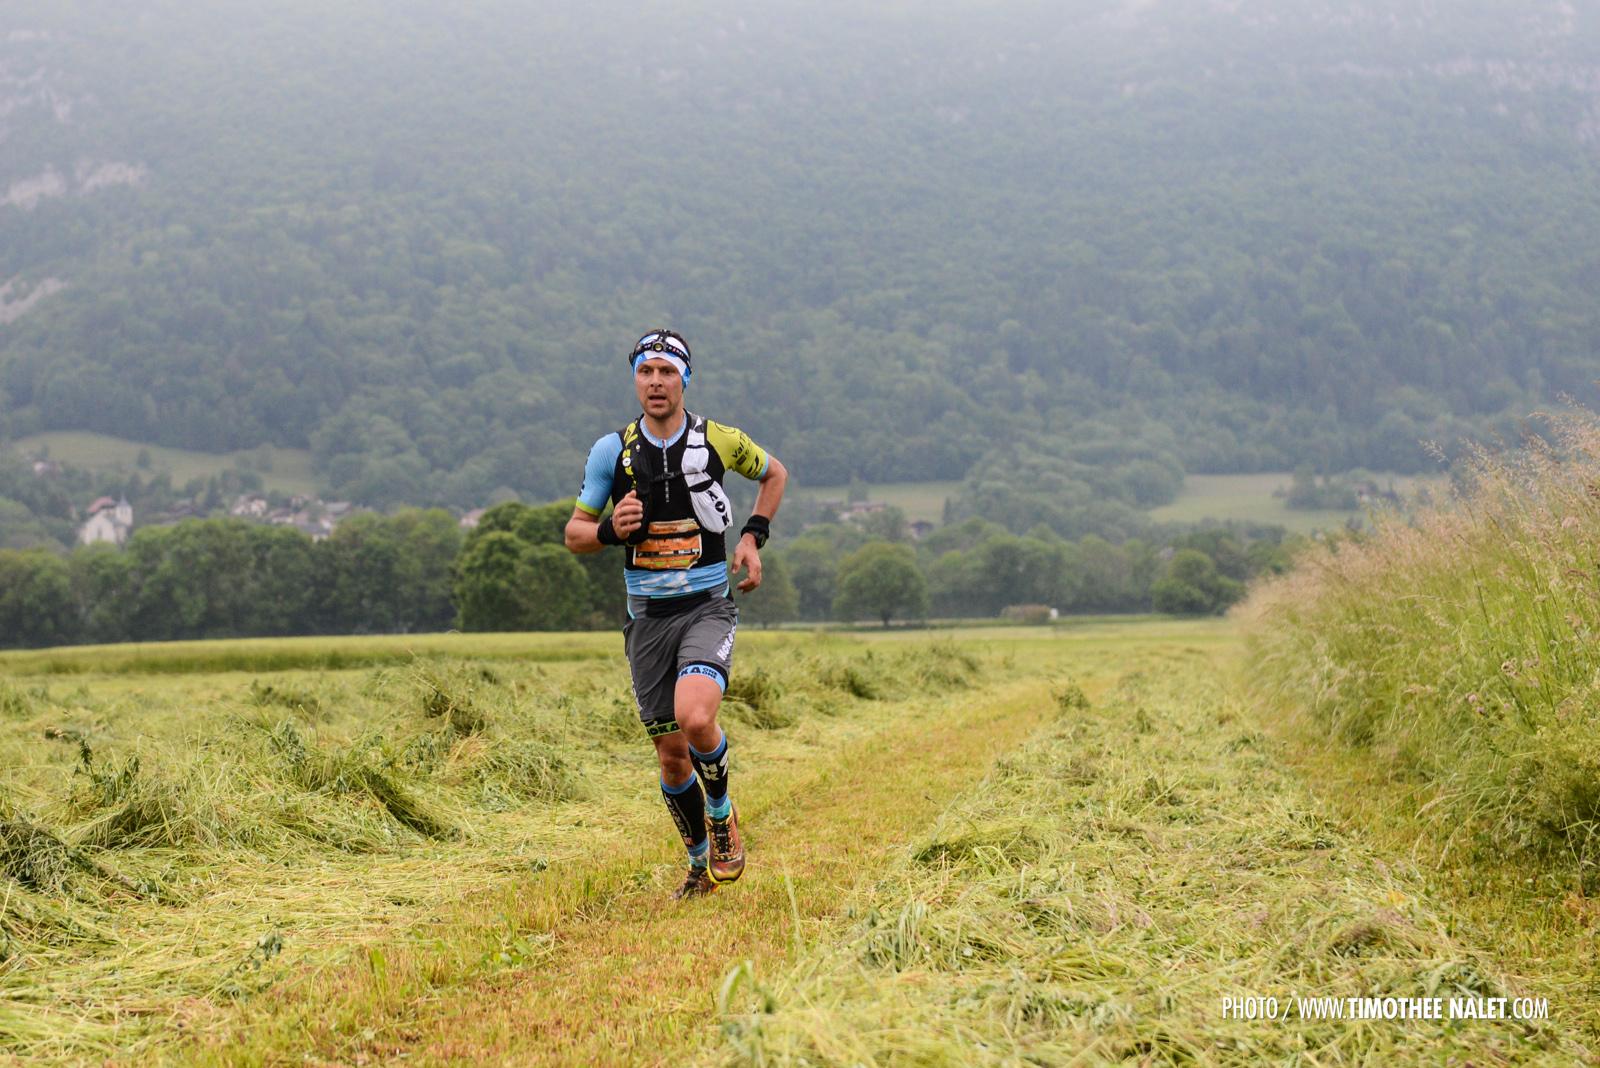 MaxiRace-Annecy-2014-Team-Hoka-Timothee-Nalet-0862.jpg